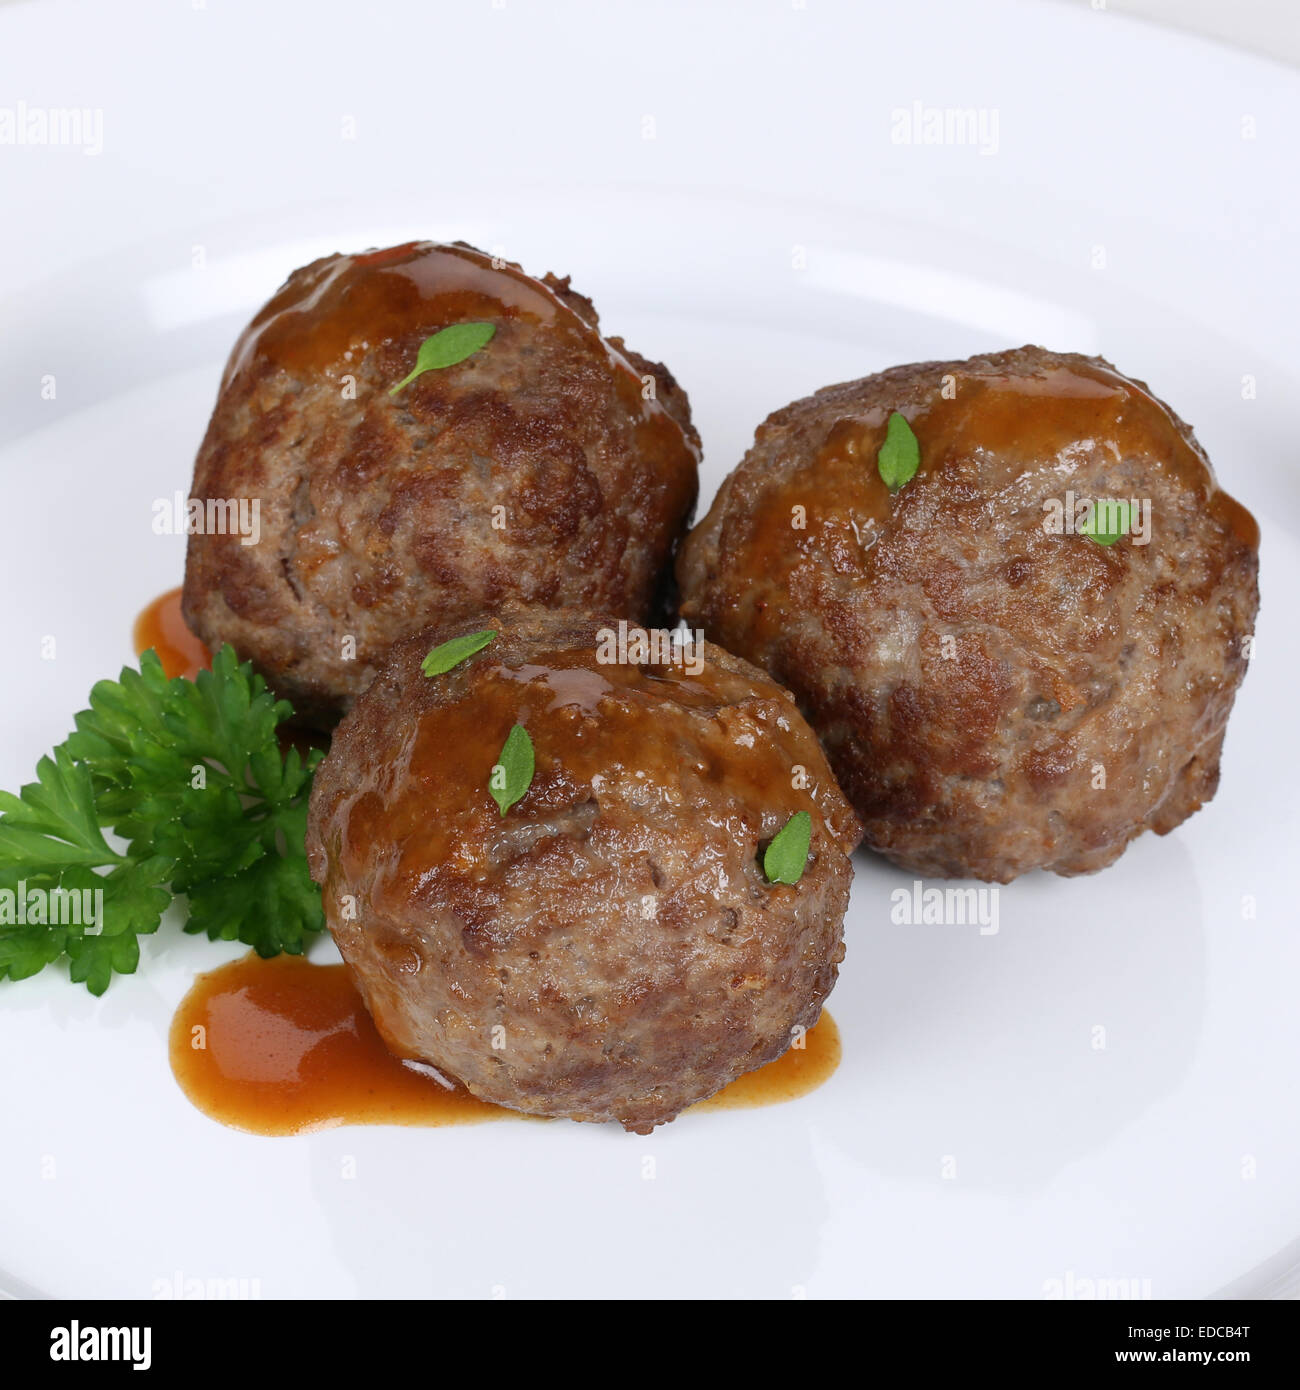 Meatballs, meat balls or Köttbullar meal on plate - Stock Image